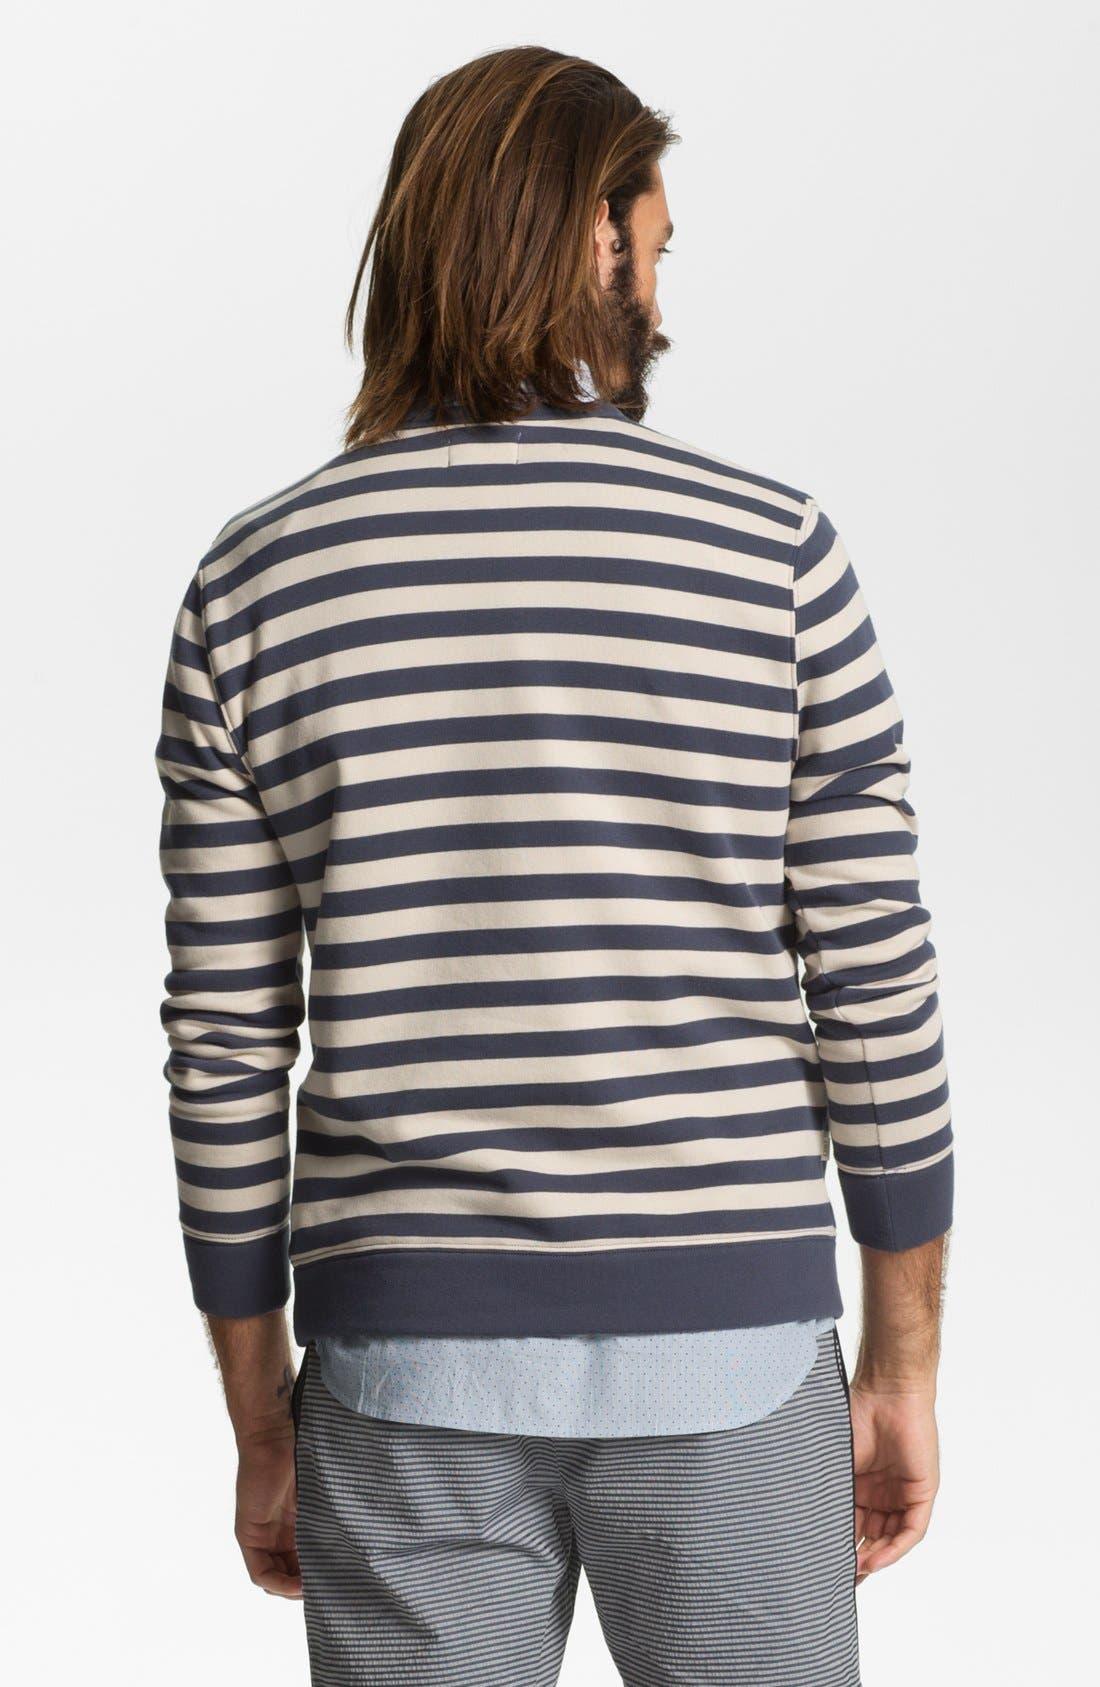 Alternate Image 2  - Obey 'Dano' Stripe Crewneck Sweatshirt